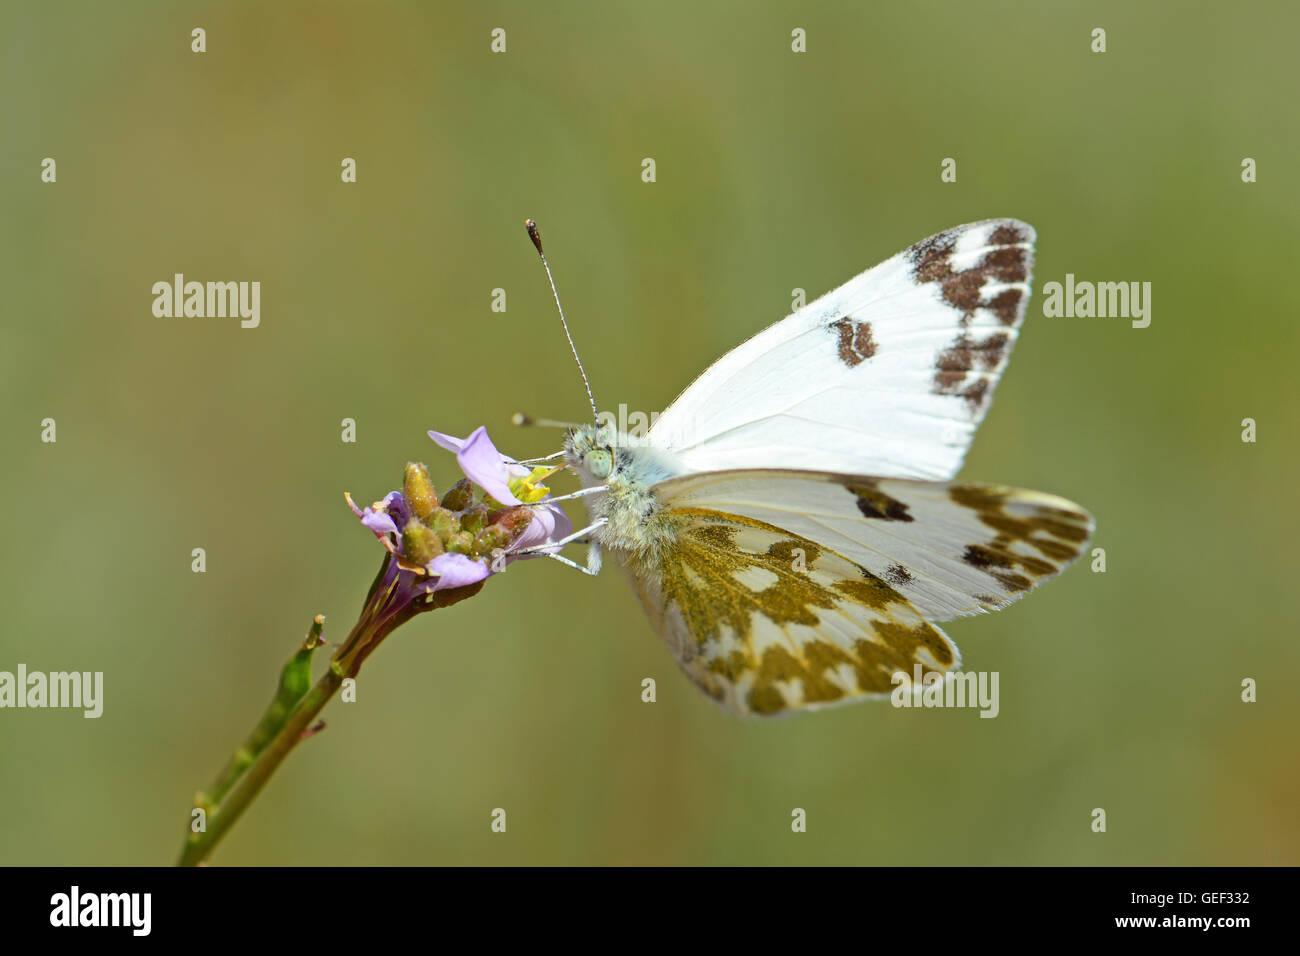 Pontia daplidice, papillon, sucer le nectar Photo Stock